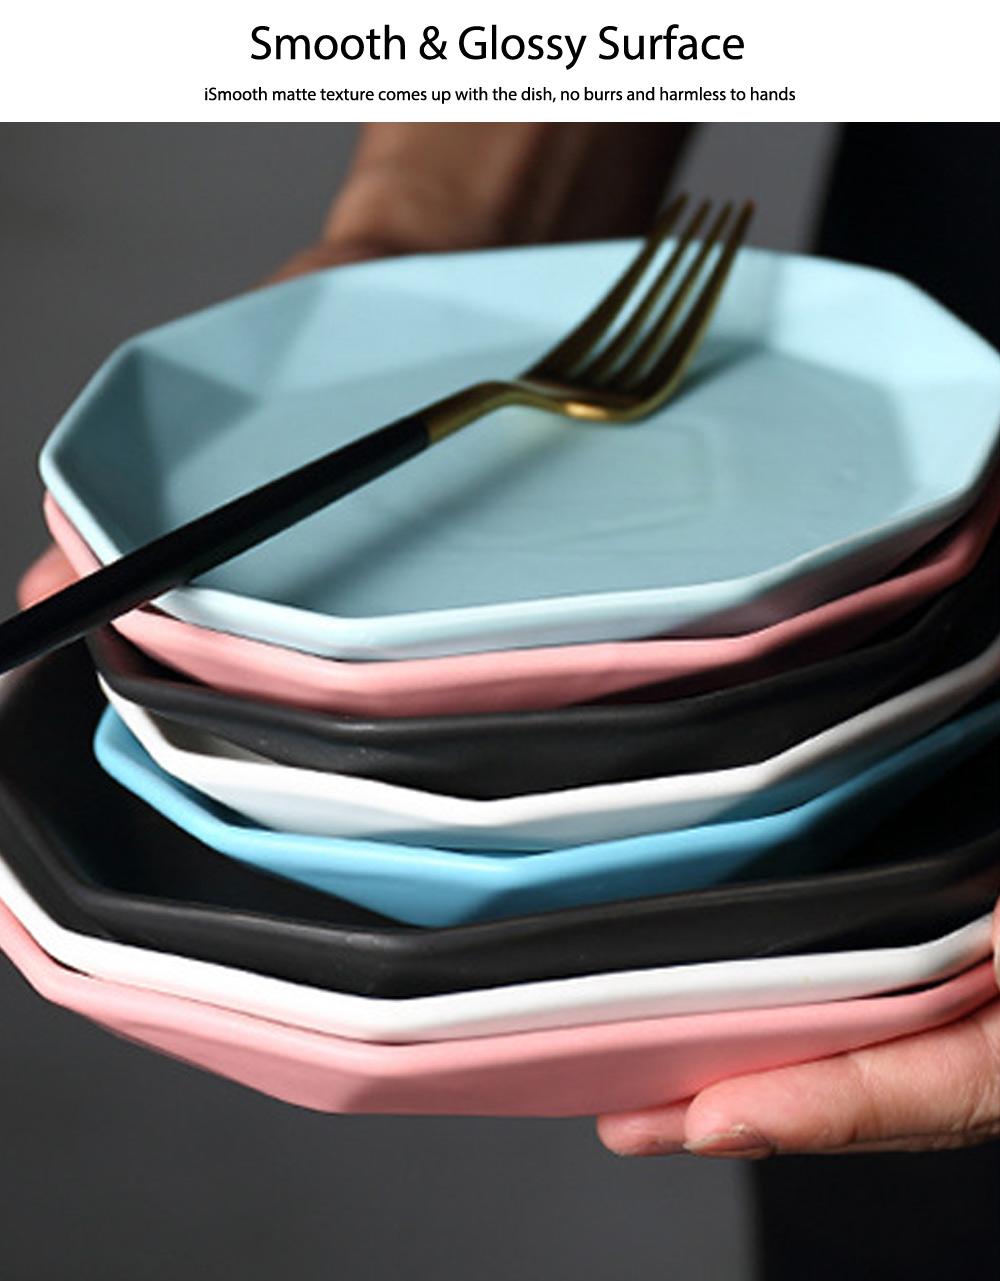 Matte Dinner Plates, Ceramic Service Dishes For Salad, Pot Pie, Pizzas, Popcorn, Fruits 2